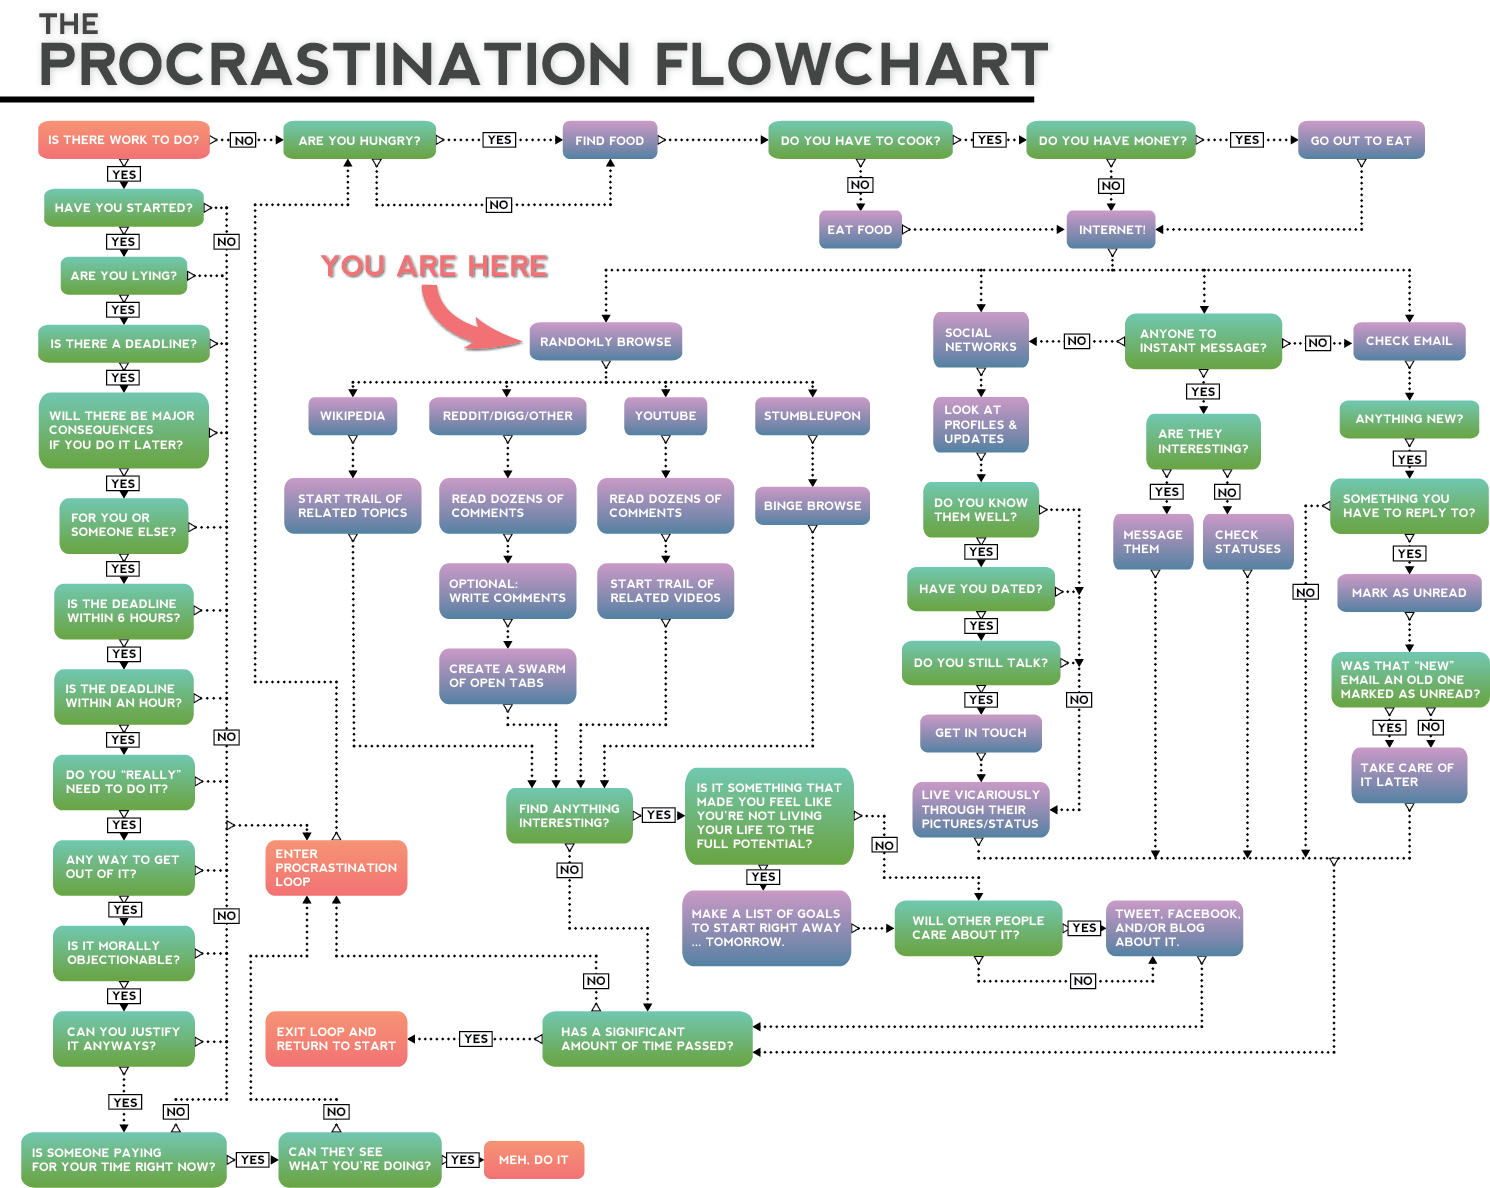 The Procrastination Flow Chart